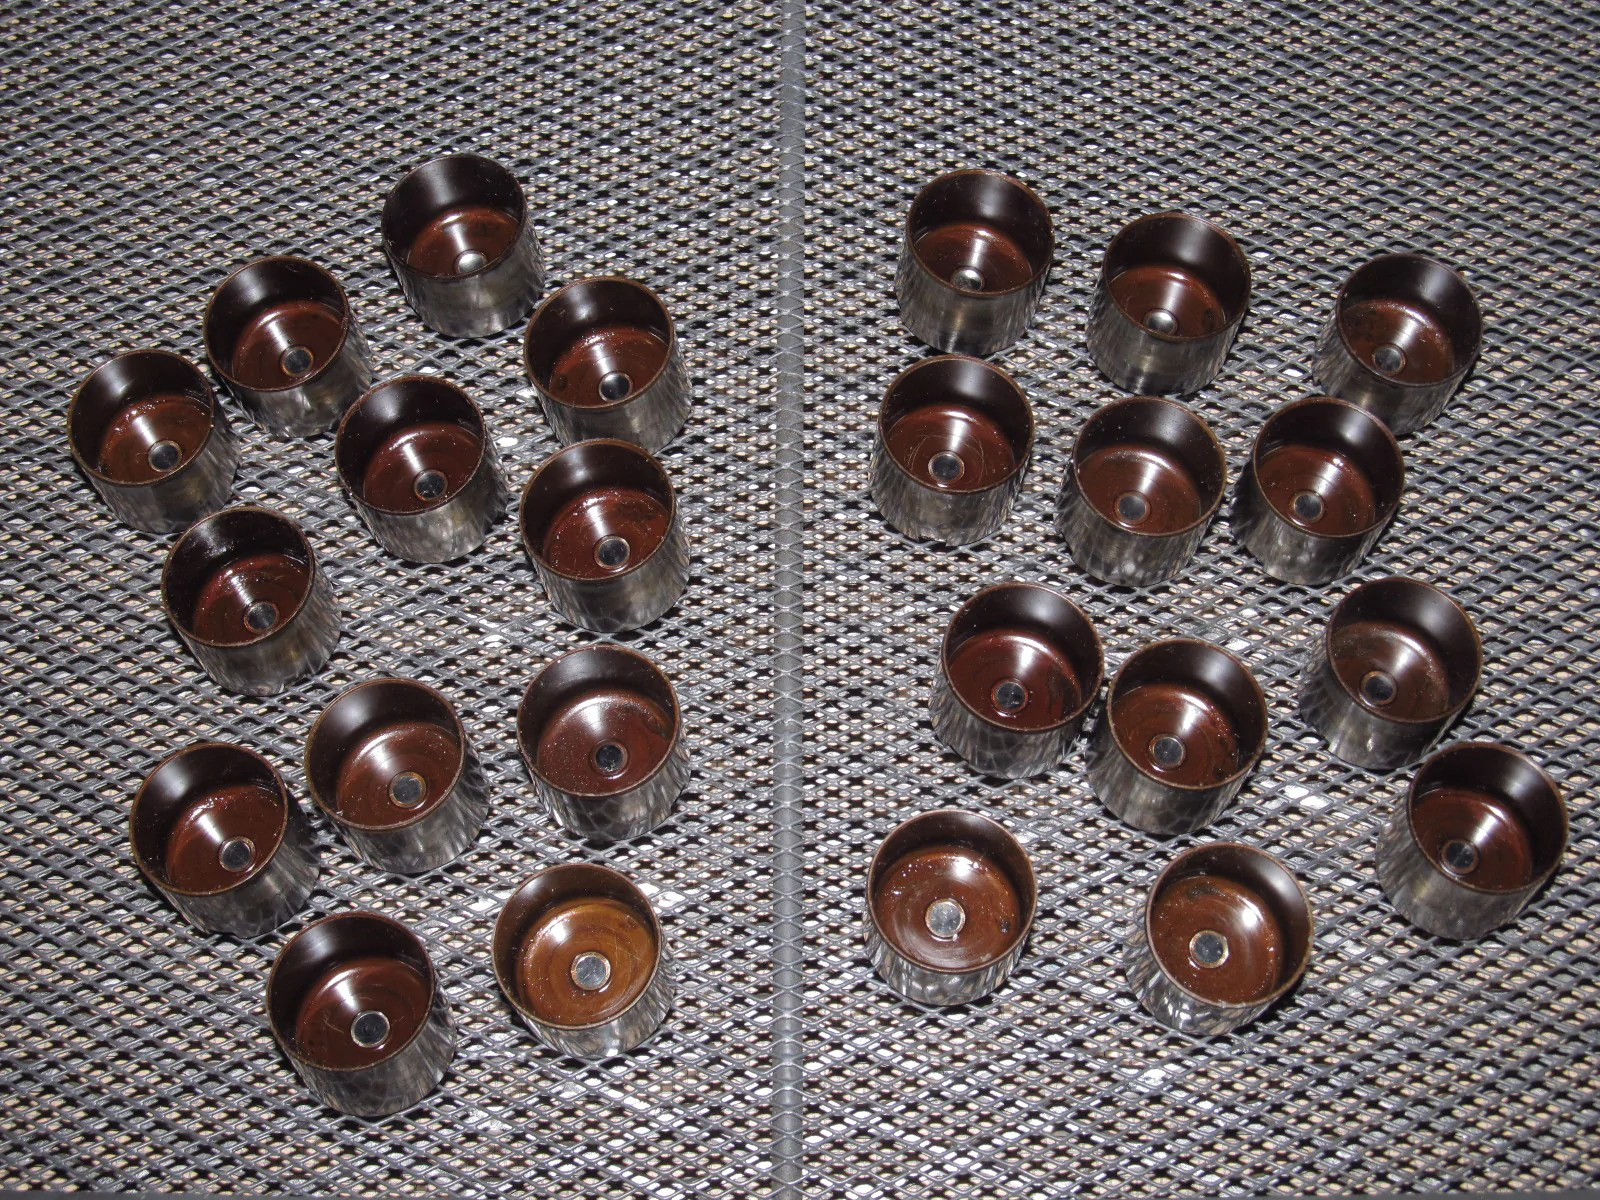 hight resolution of  89 90 91 92 toyota supra oem engine cylinder head valve shims cap